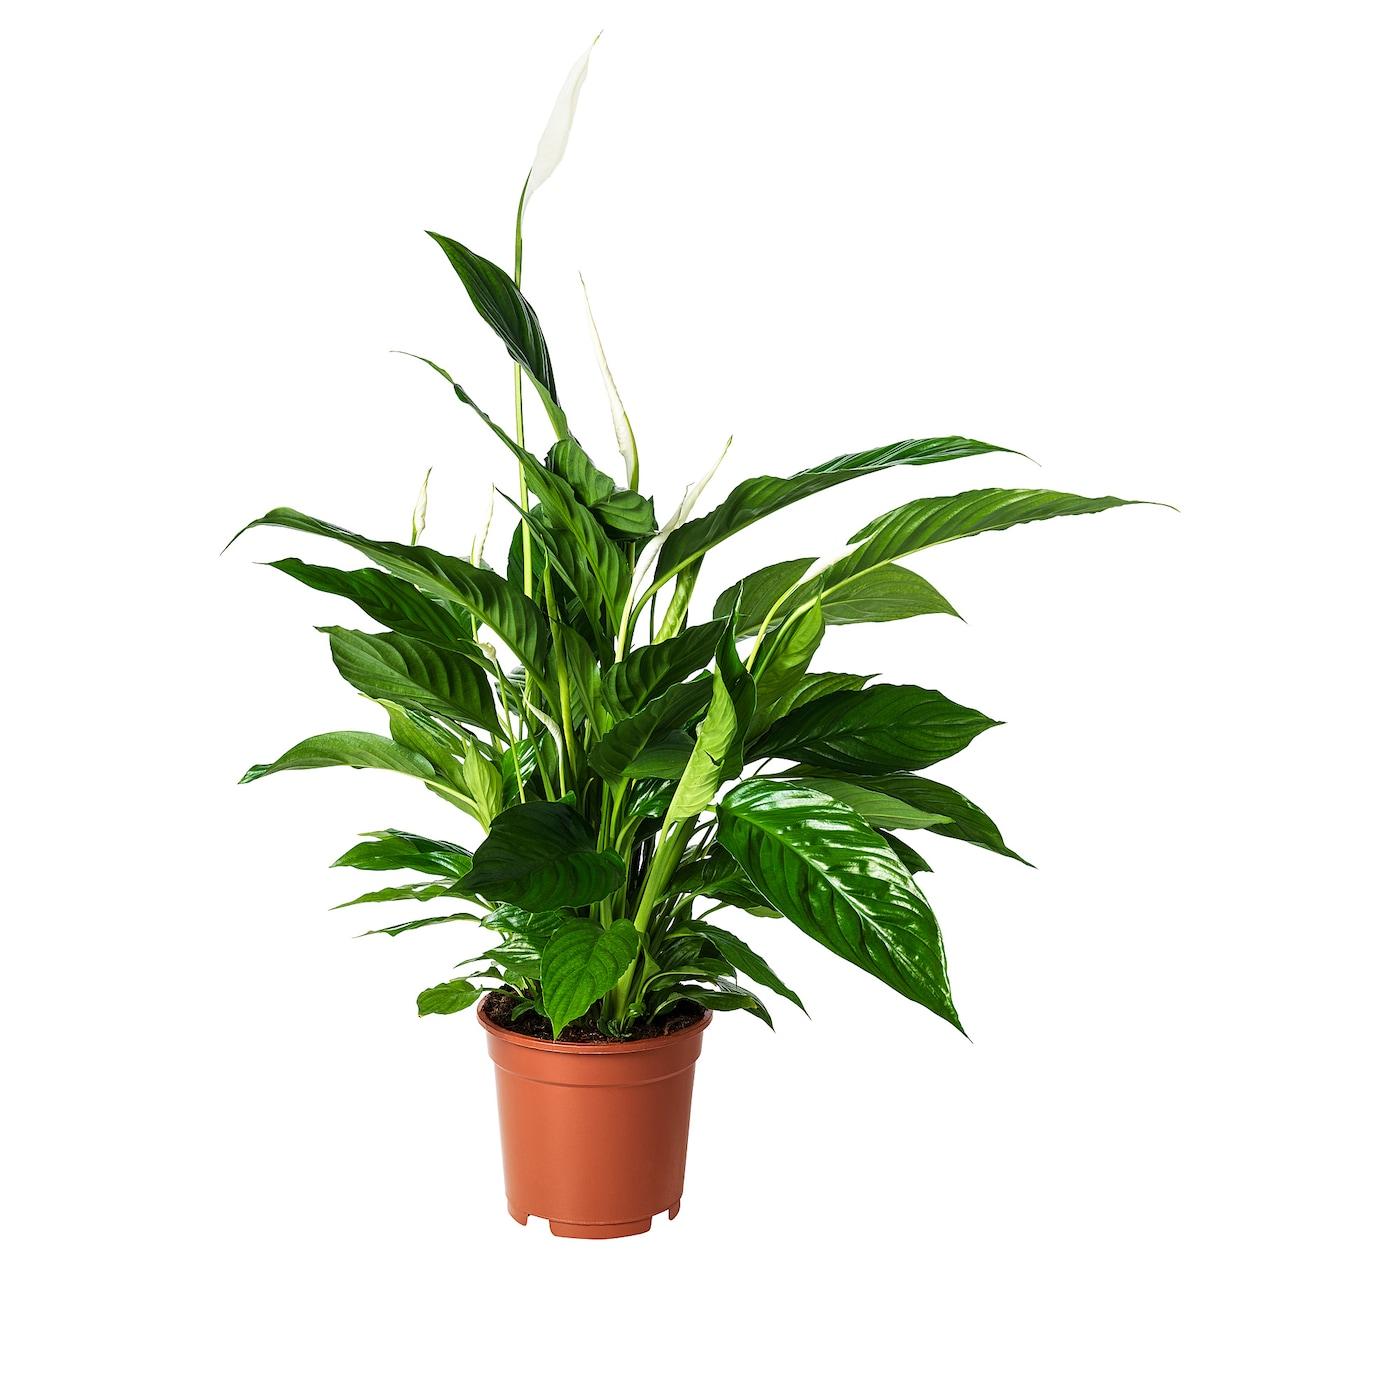 Ikea Spathiphyllum Potted Plant